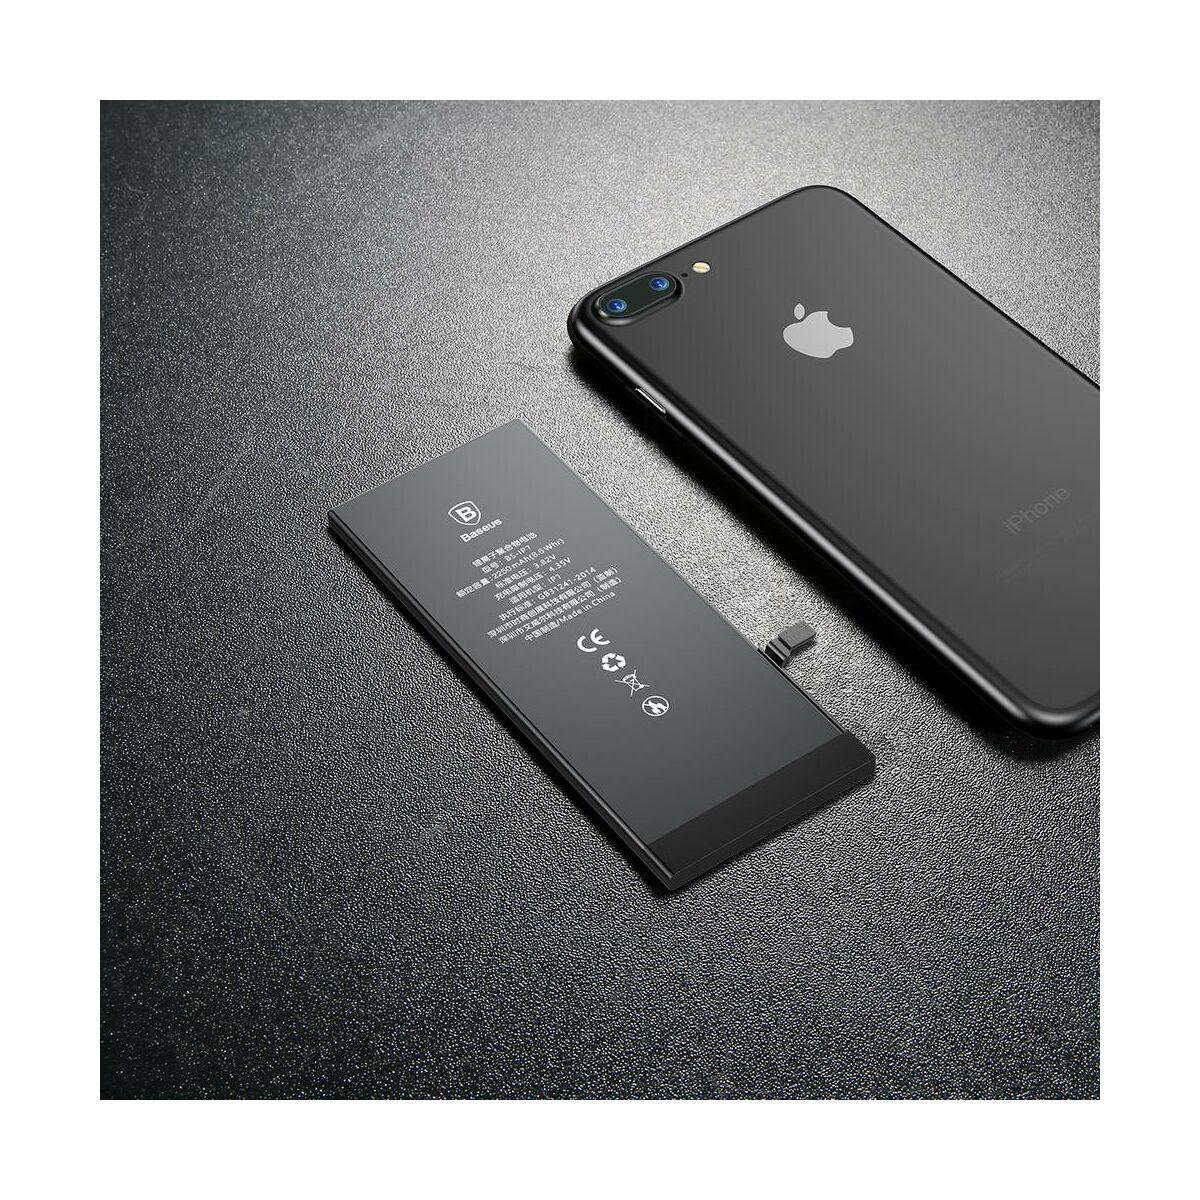 Baseus nagy teljesítményű akkumulátor iPhone 7-hez, 2250 mAh (ACCB-BIP7)